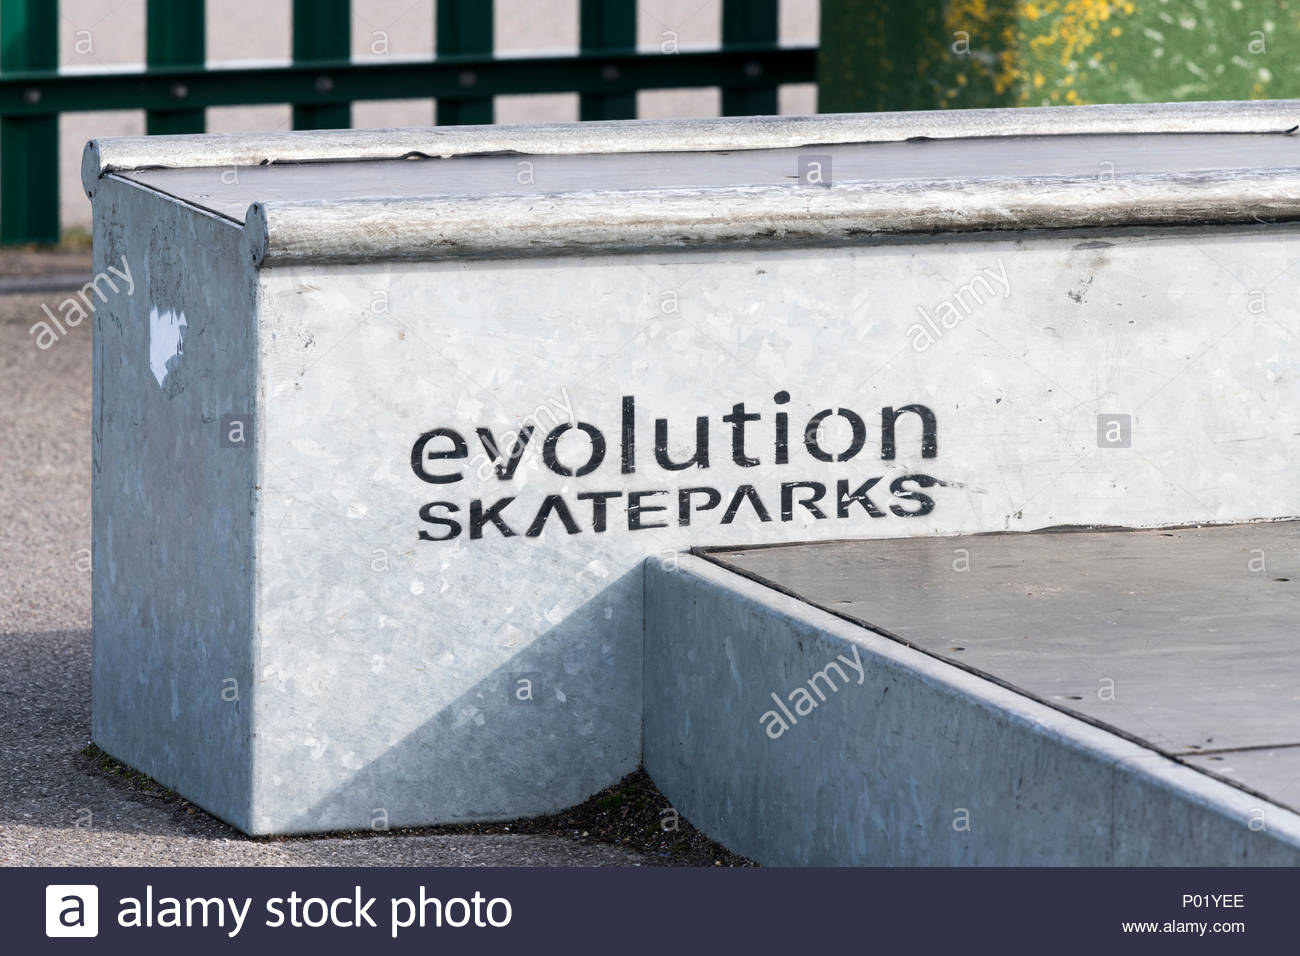 Evolution skateparks, Blandford, Dorset, England, UK - Stock Image